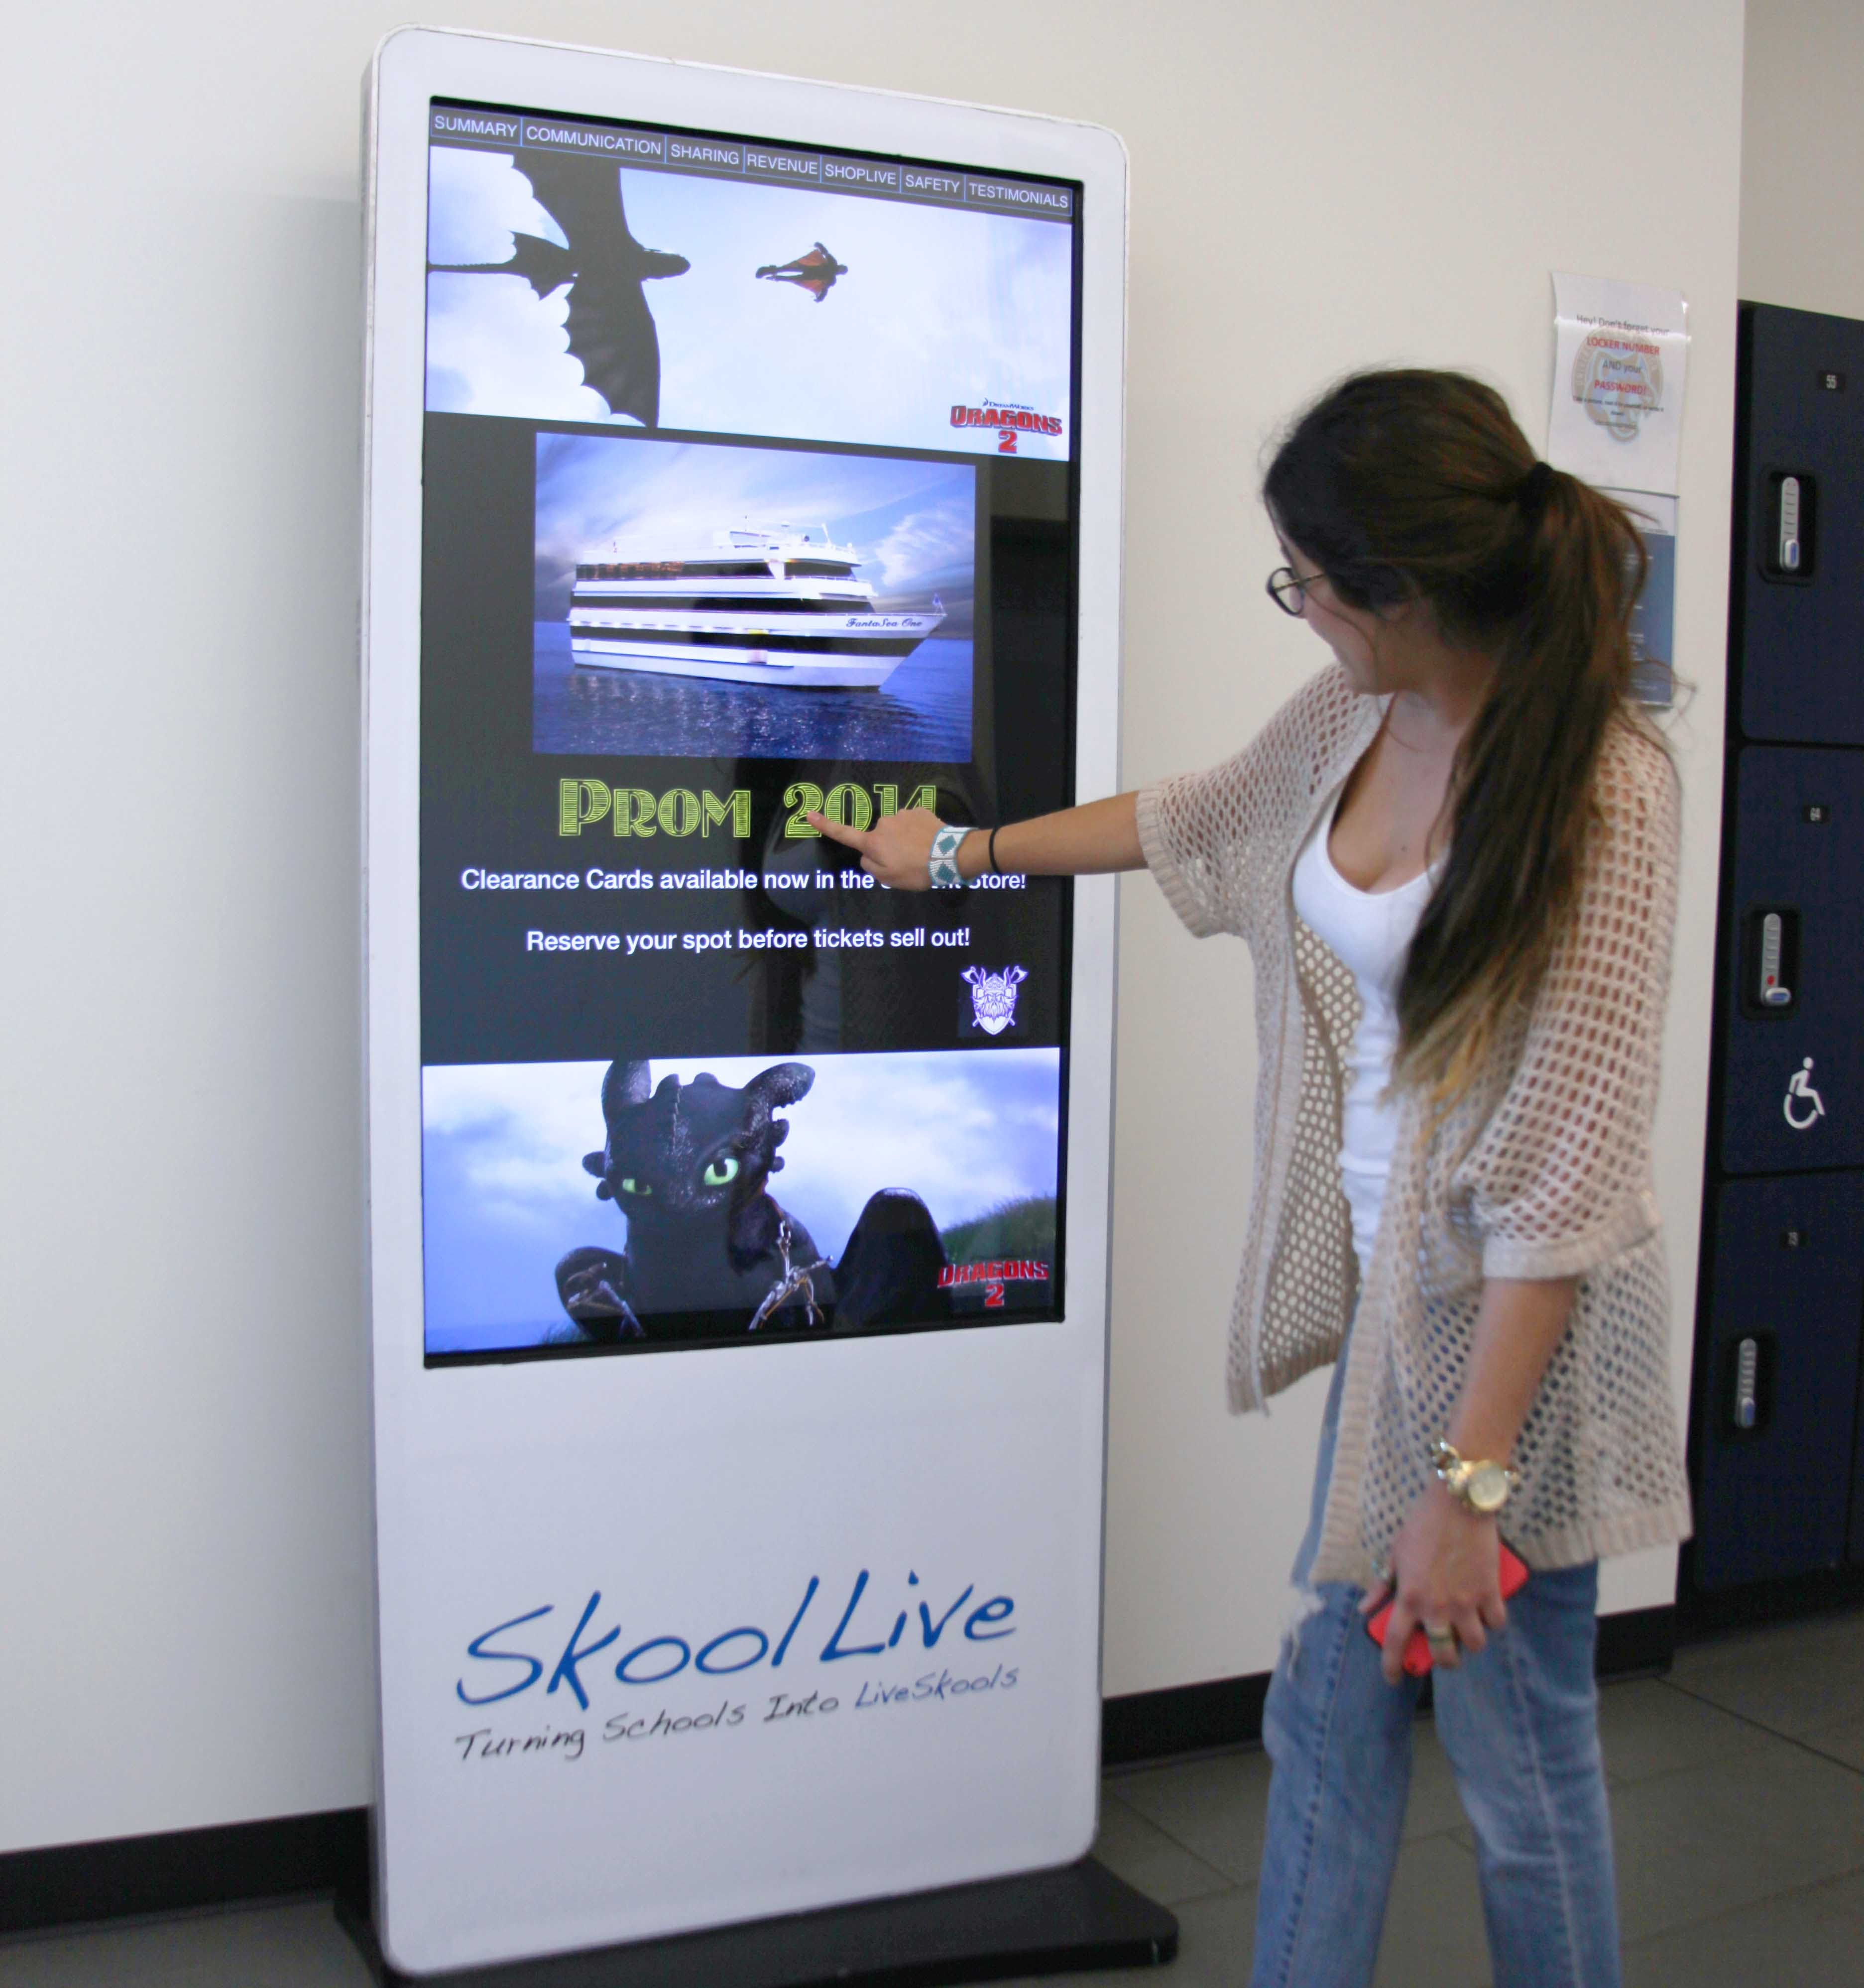 Schools that want digital billboards in hallways: Coachella Valley Unified (CA)